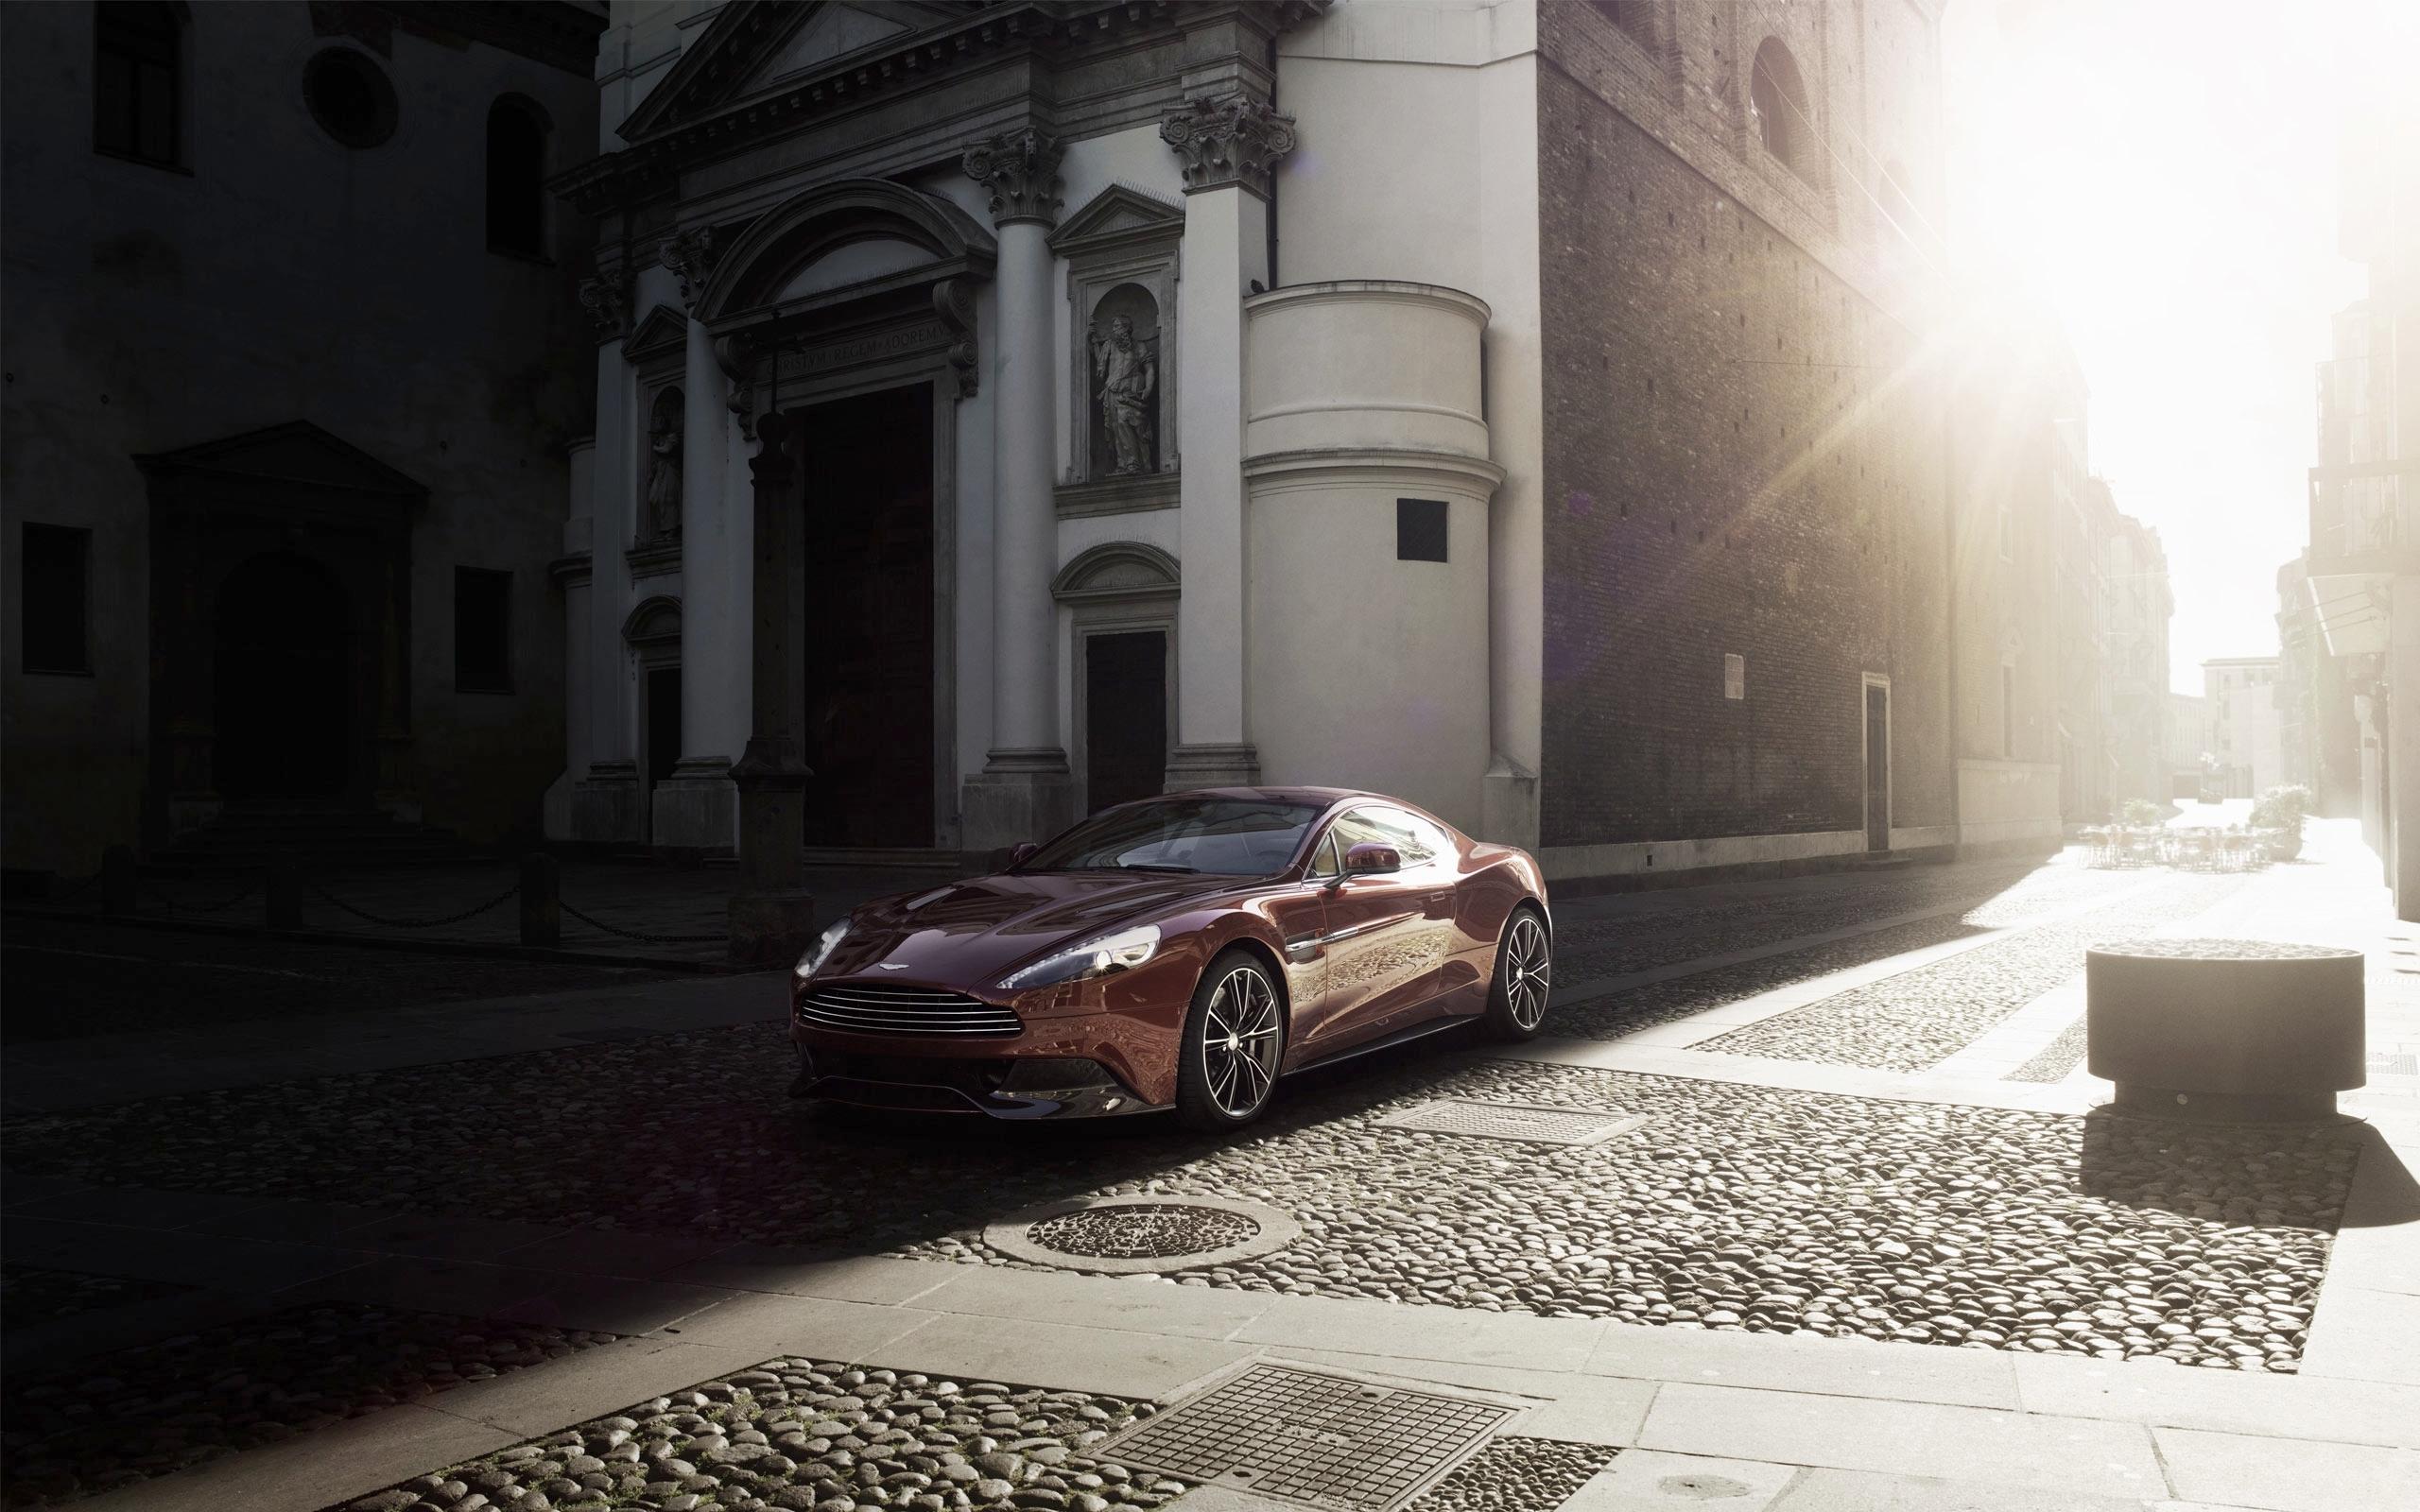 Aston Martin суперкар ночь город  № 2374871 бесплатно